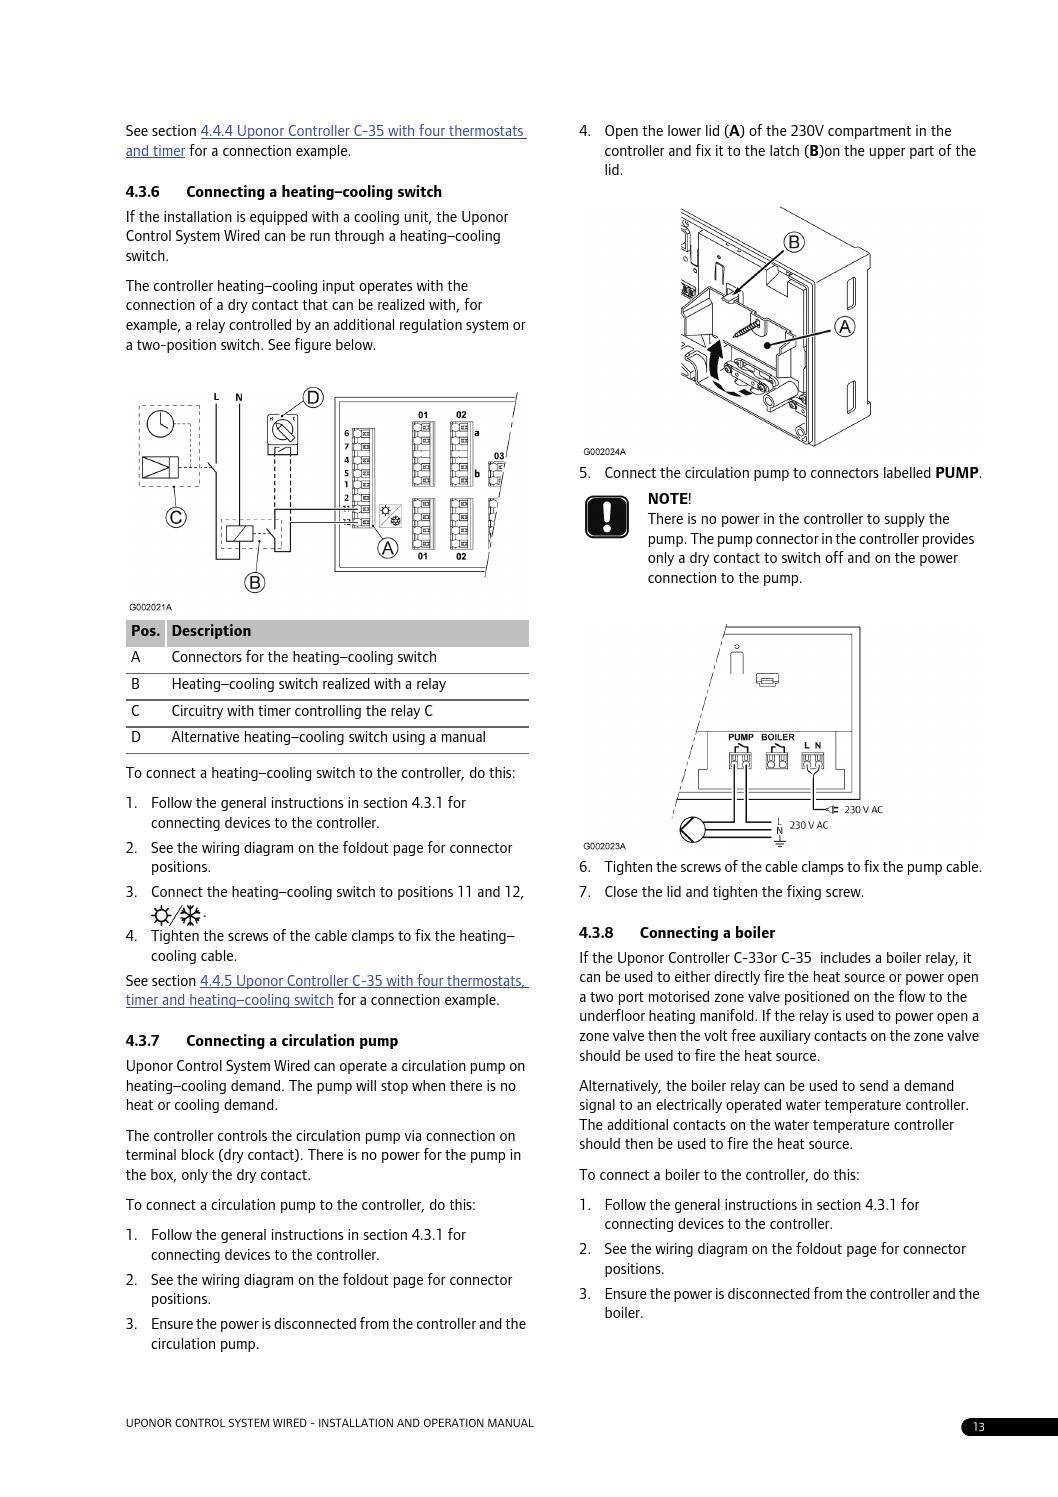 C35 Manual By Uponor Uk Issuu Circulator Pump Relay Wiring